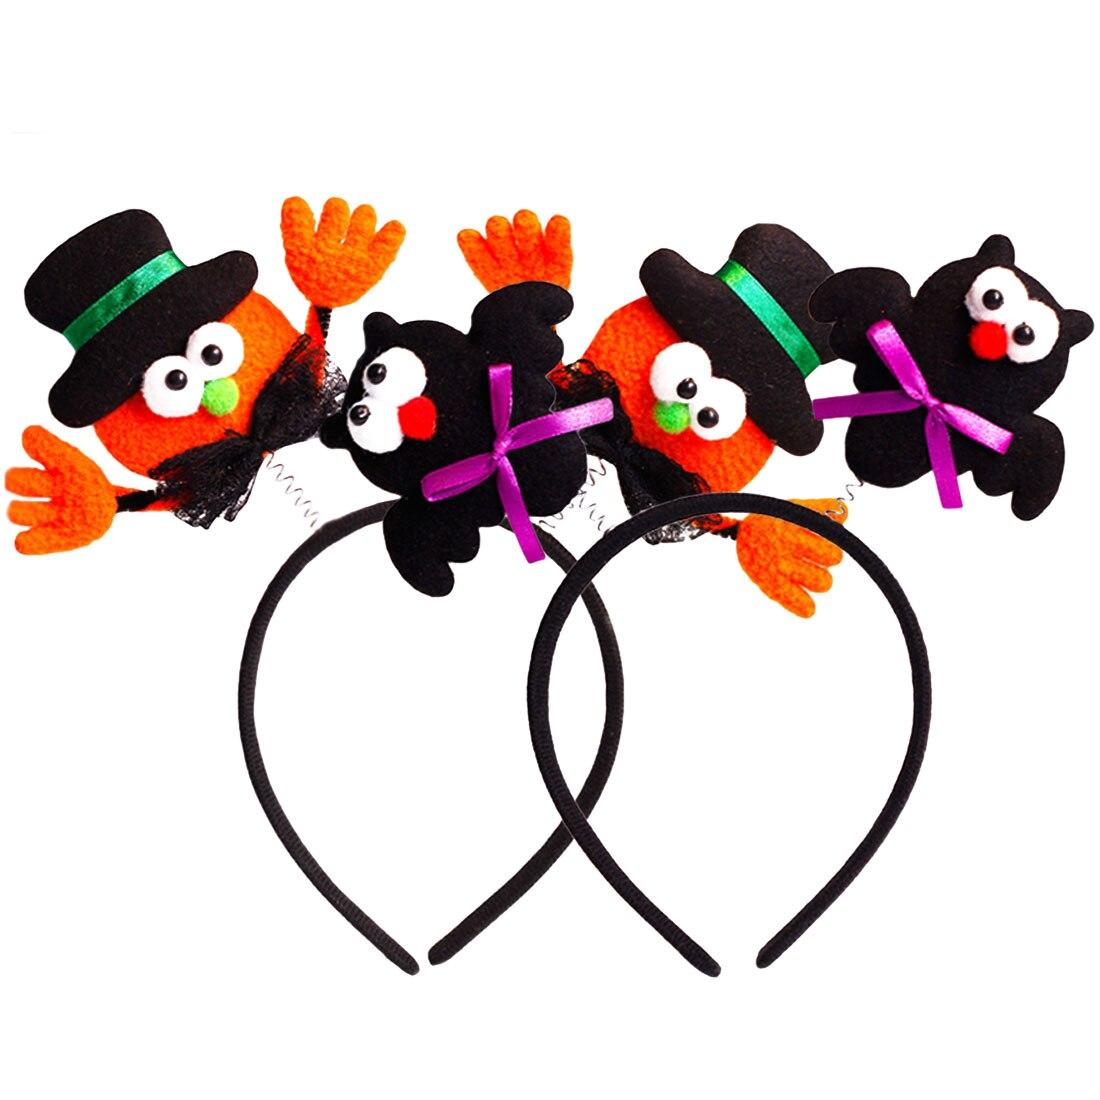 aliexpress : buy halloween variety of cute headbands headband